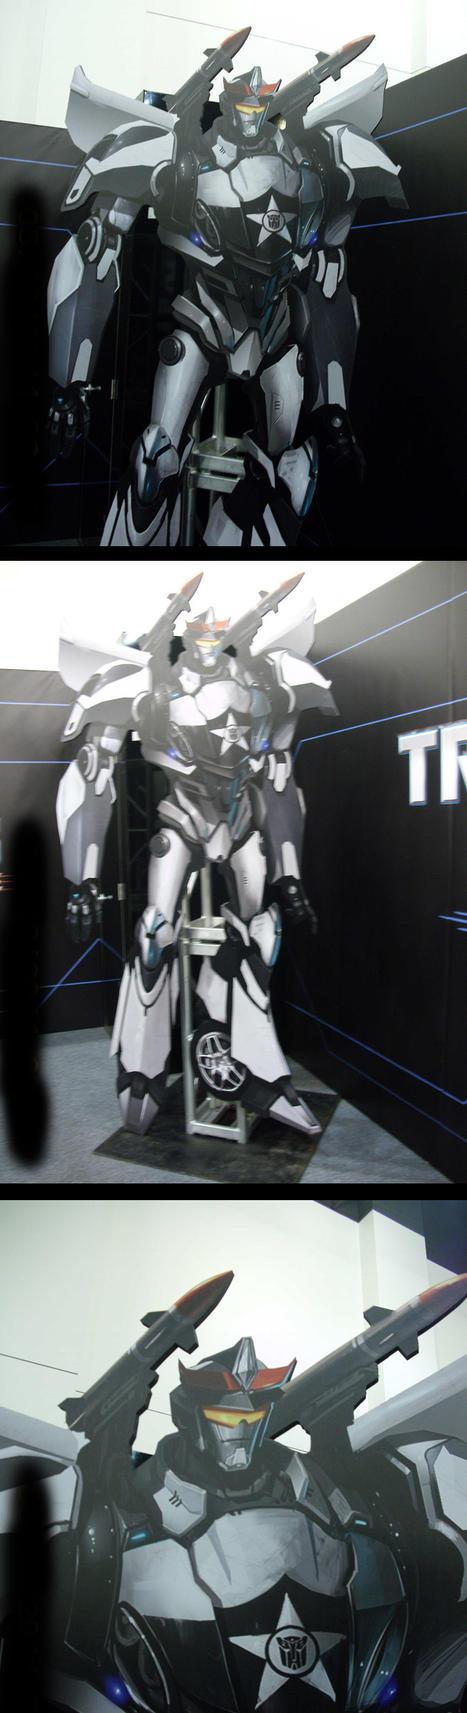 Transformers Prime Prowl by Ty-Chou